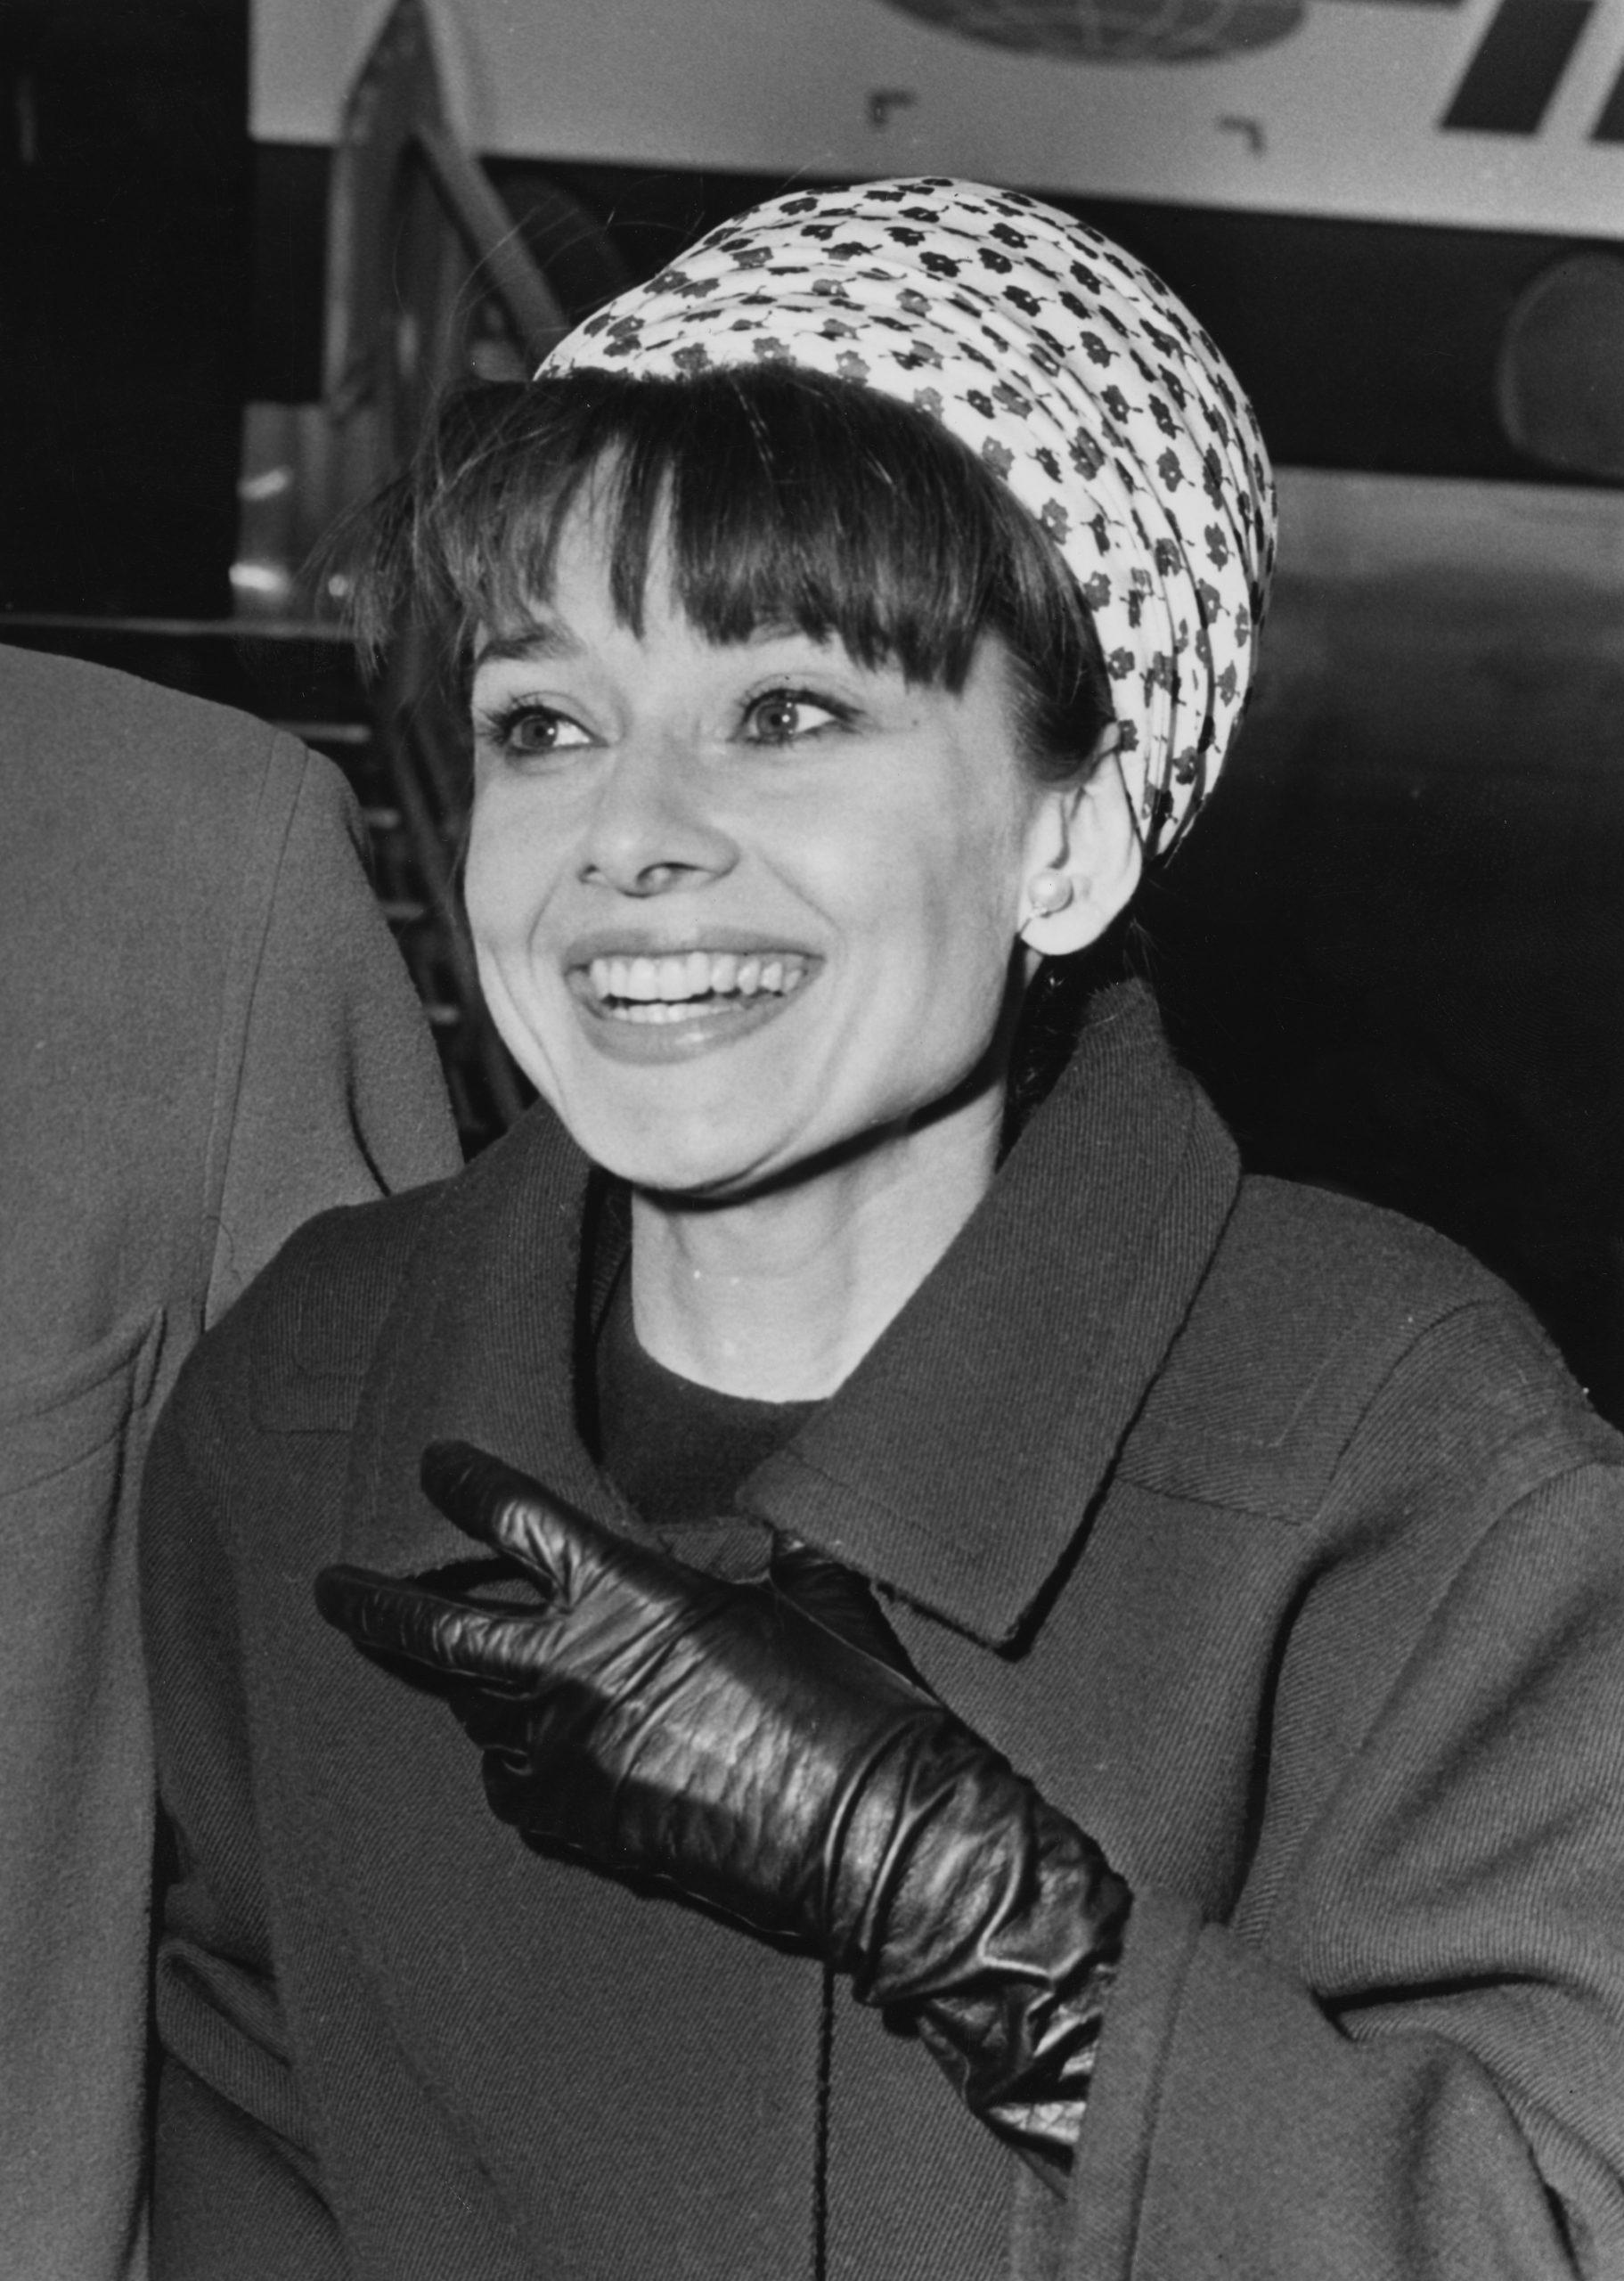 Audrey Hepburn en el aeropuerto de Londres en 1964 / Foto: Getty Images